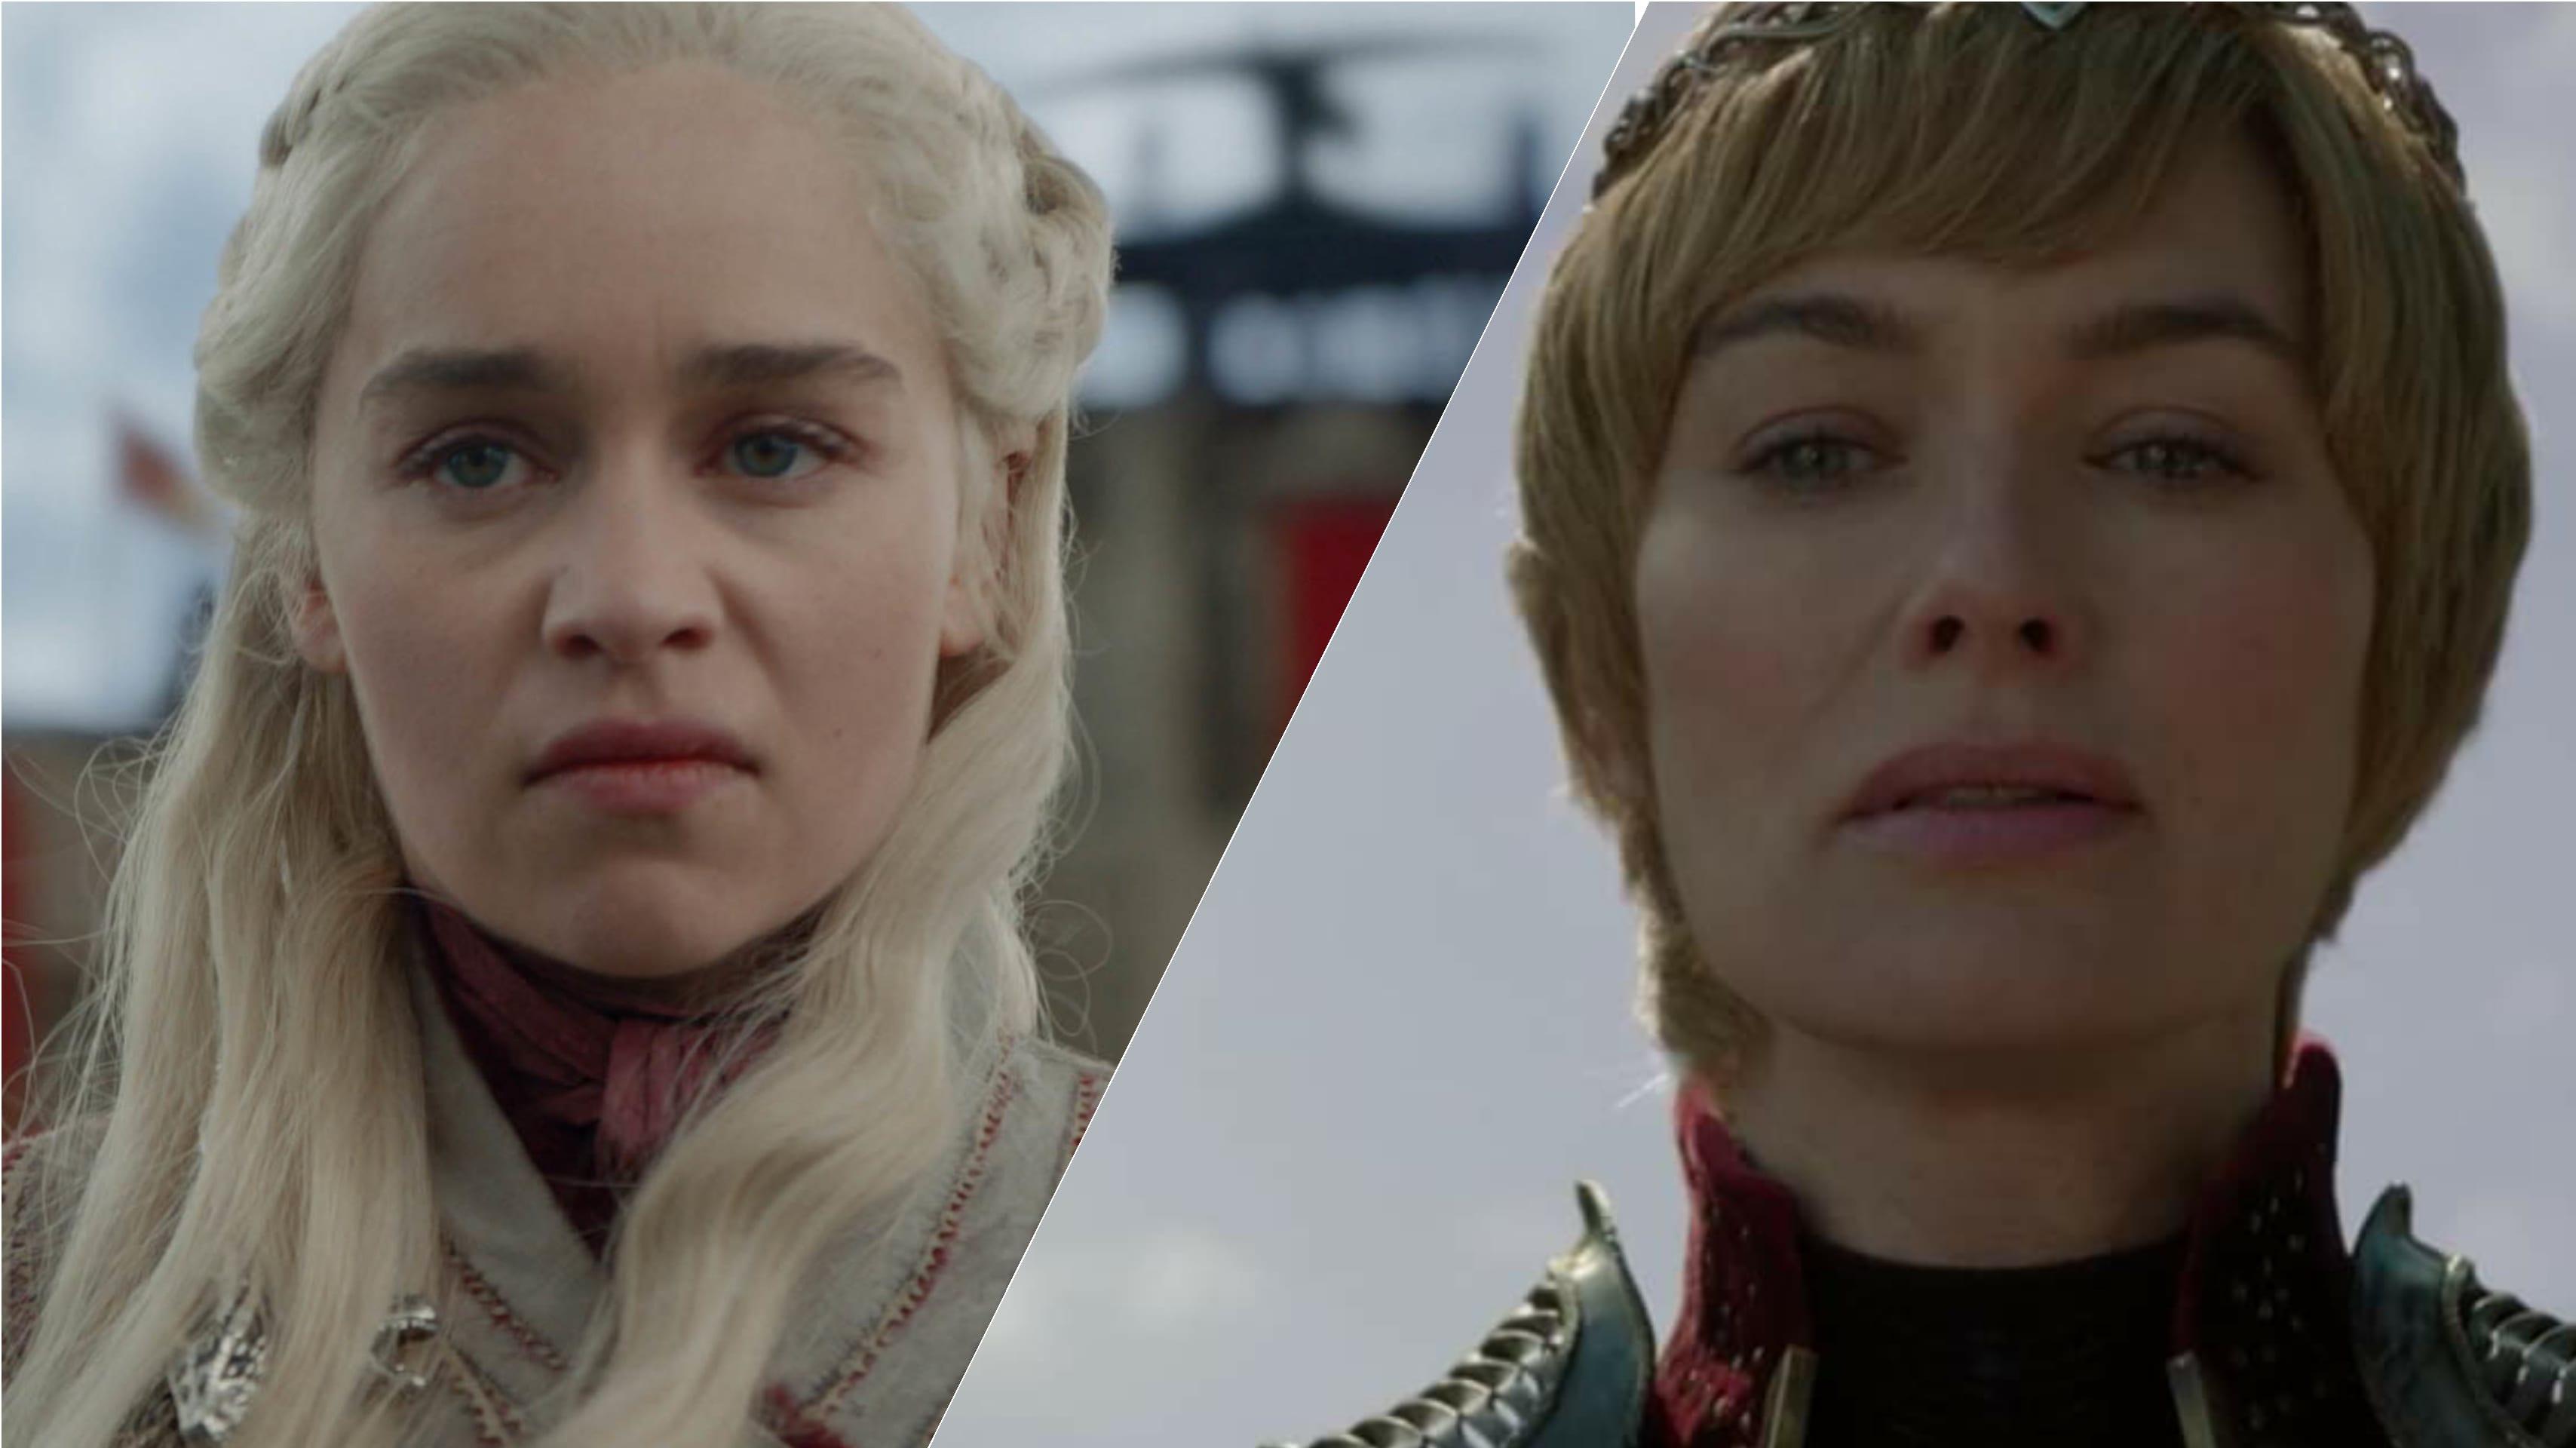 Game of Thrones Season 8 episode 5 leaks